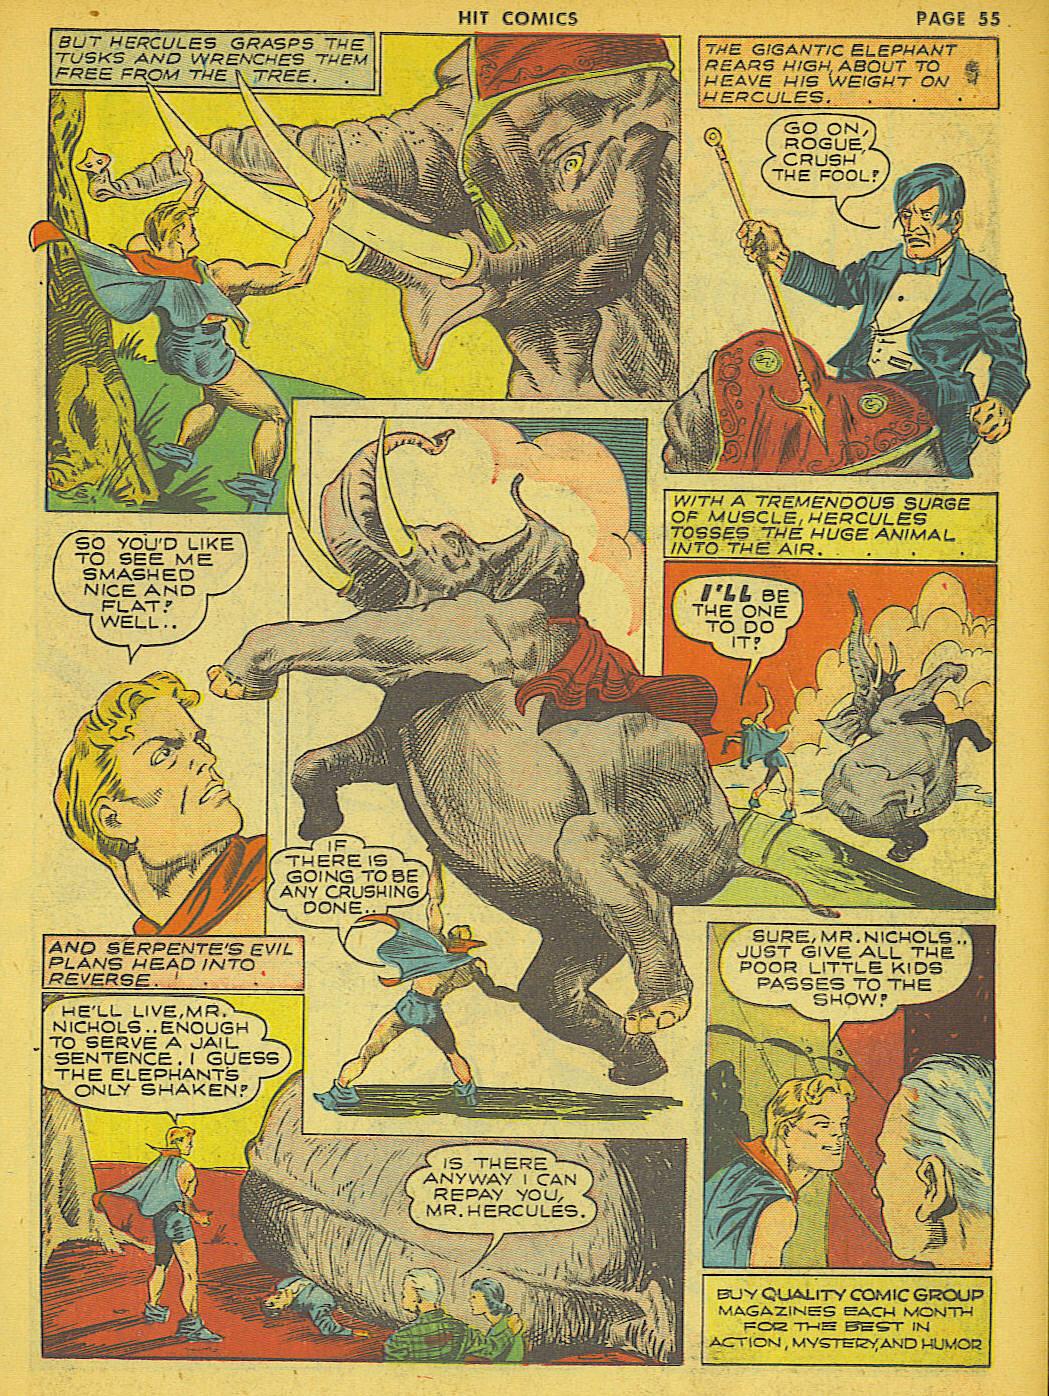 Read online Hit Comics comic -  Issue #21 - 57